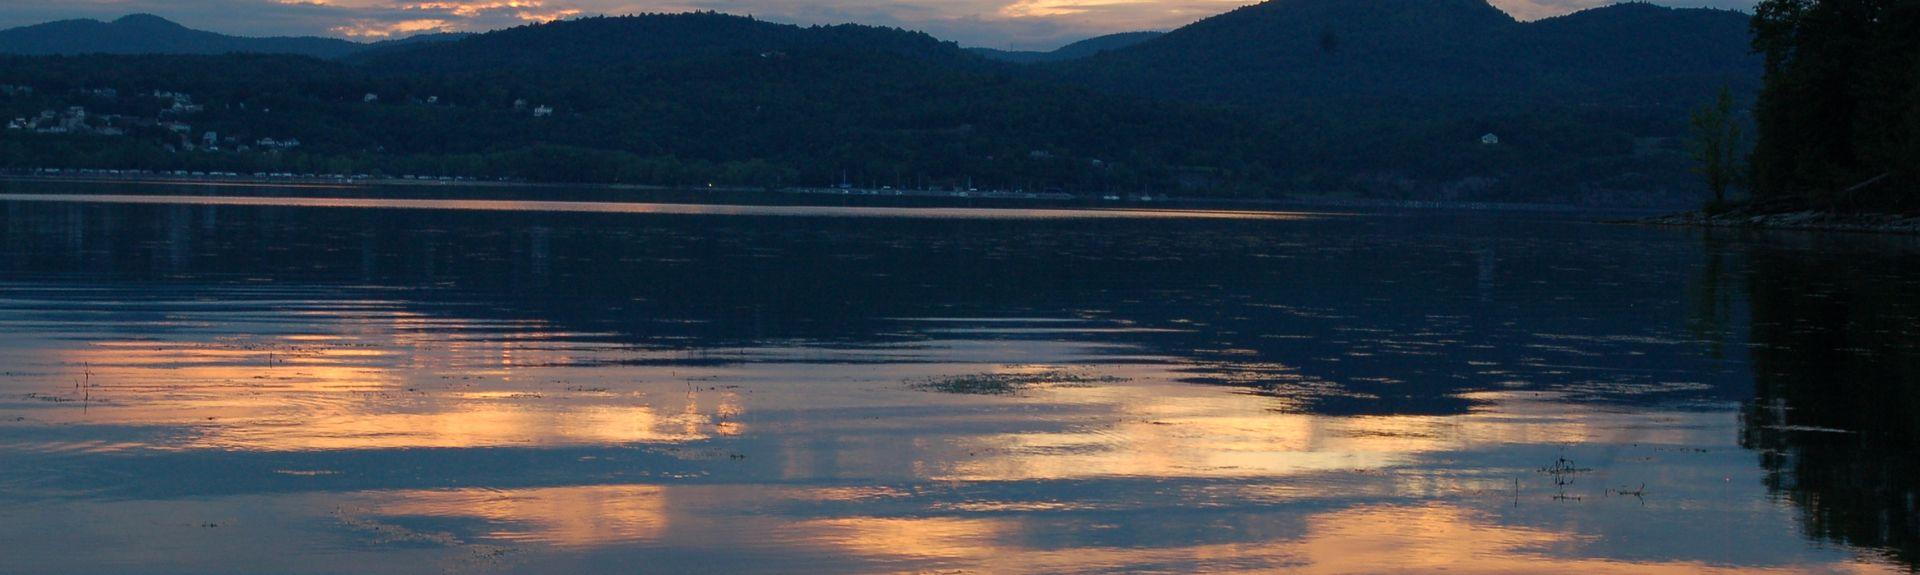 Lake Champlain Maritime Museum, Vergennes, Vermont, United States of America